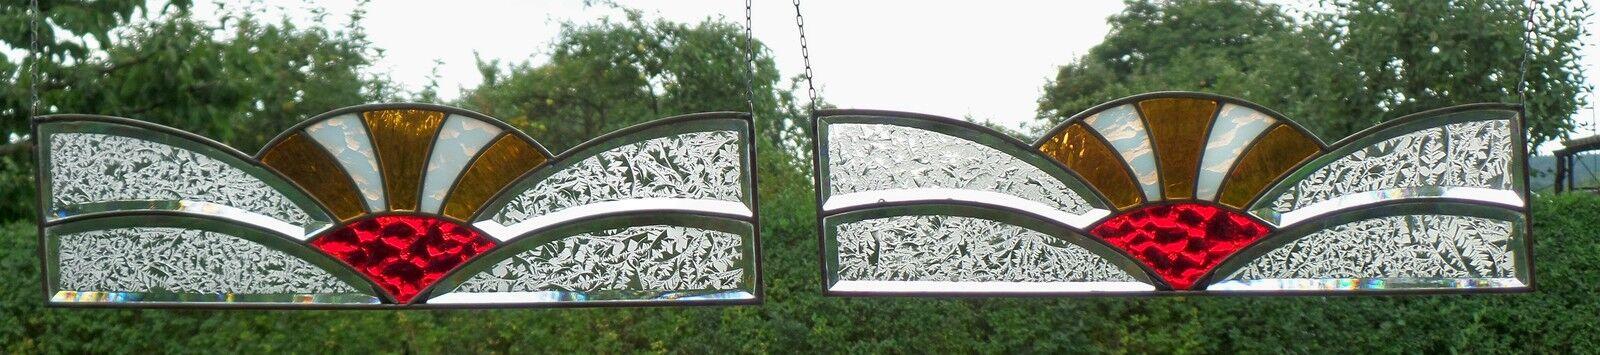 Stained Glass Leaded 2 St.Window Image Screening brisevue Original Art Deco